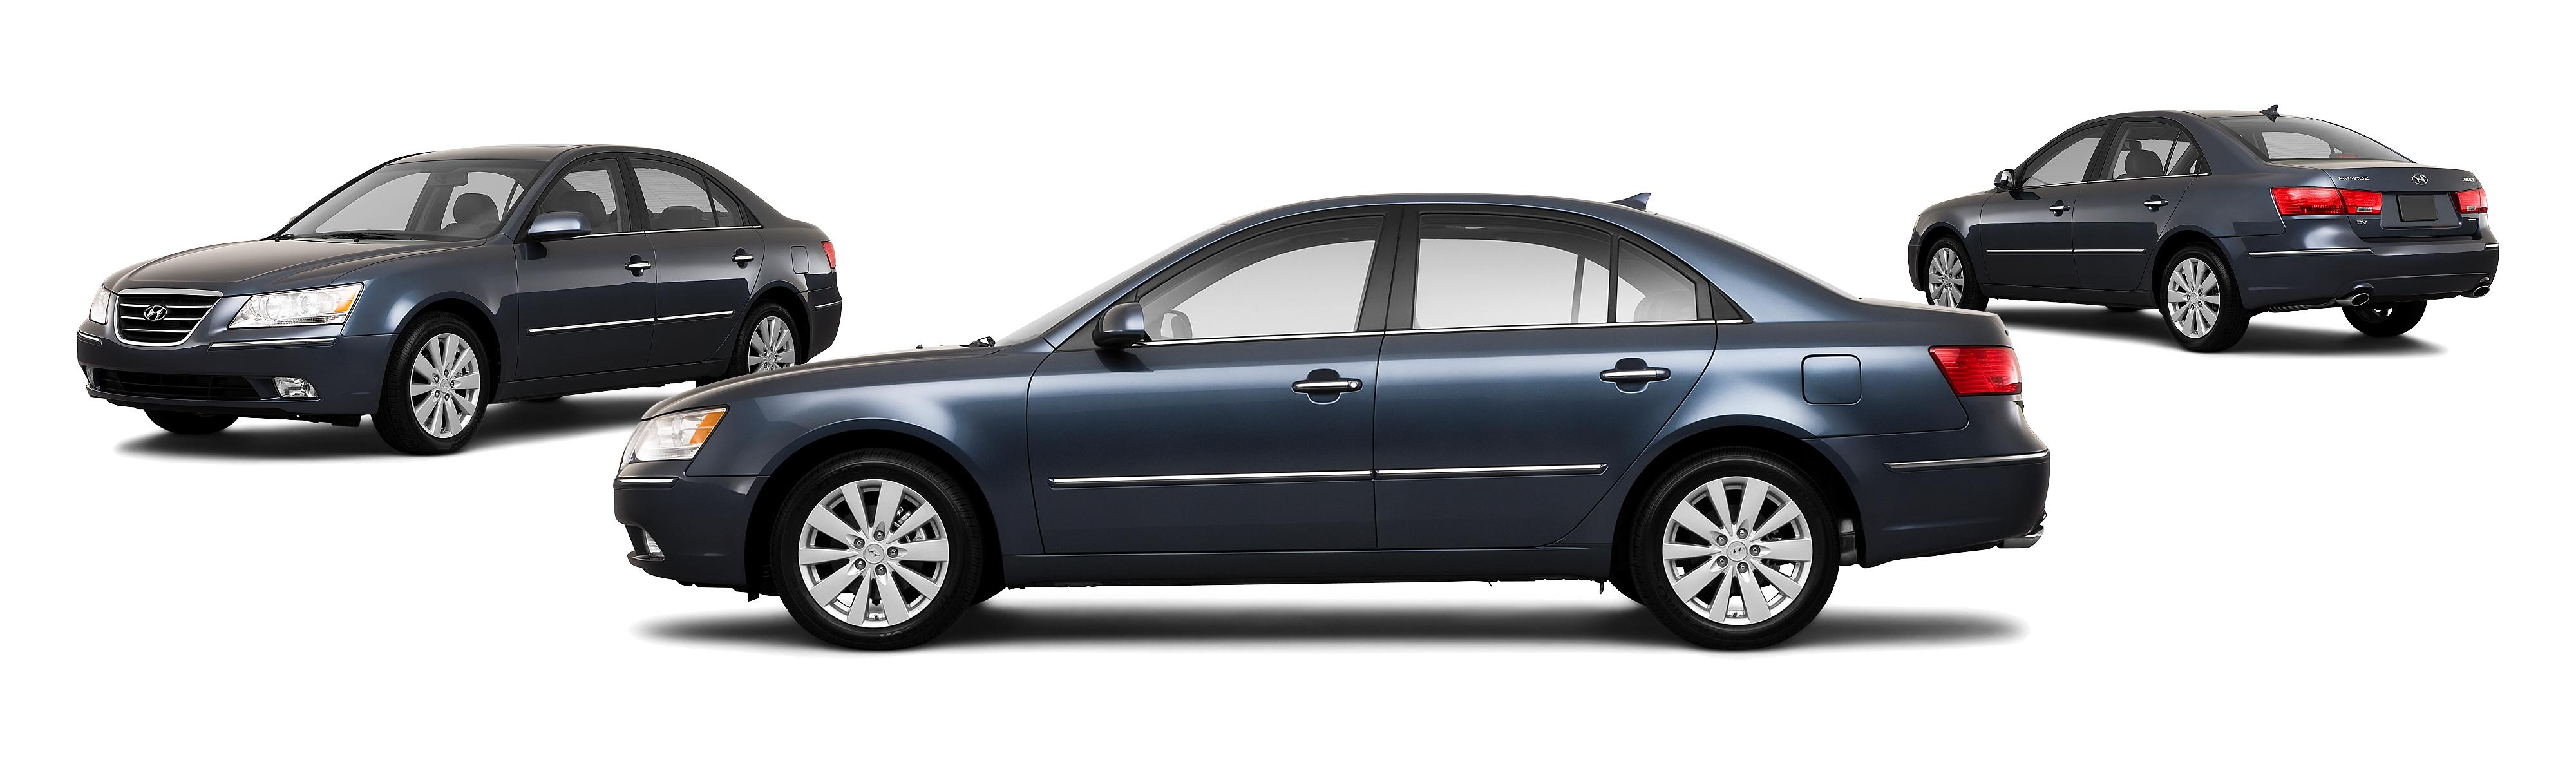 2010 Hyundai Sonata Limited V6 4dr Sedan Research Groovecar